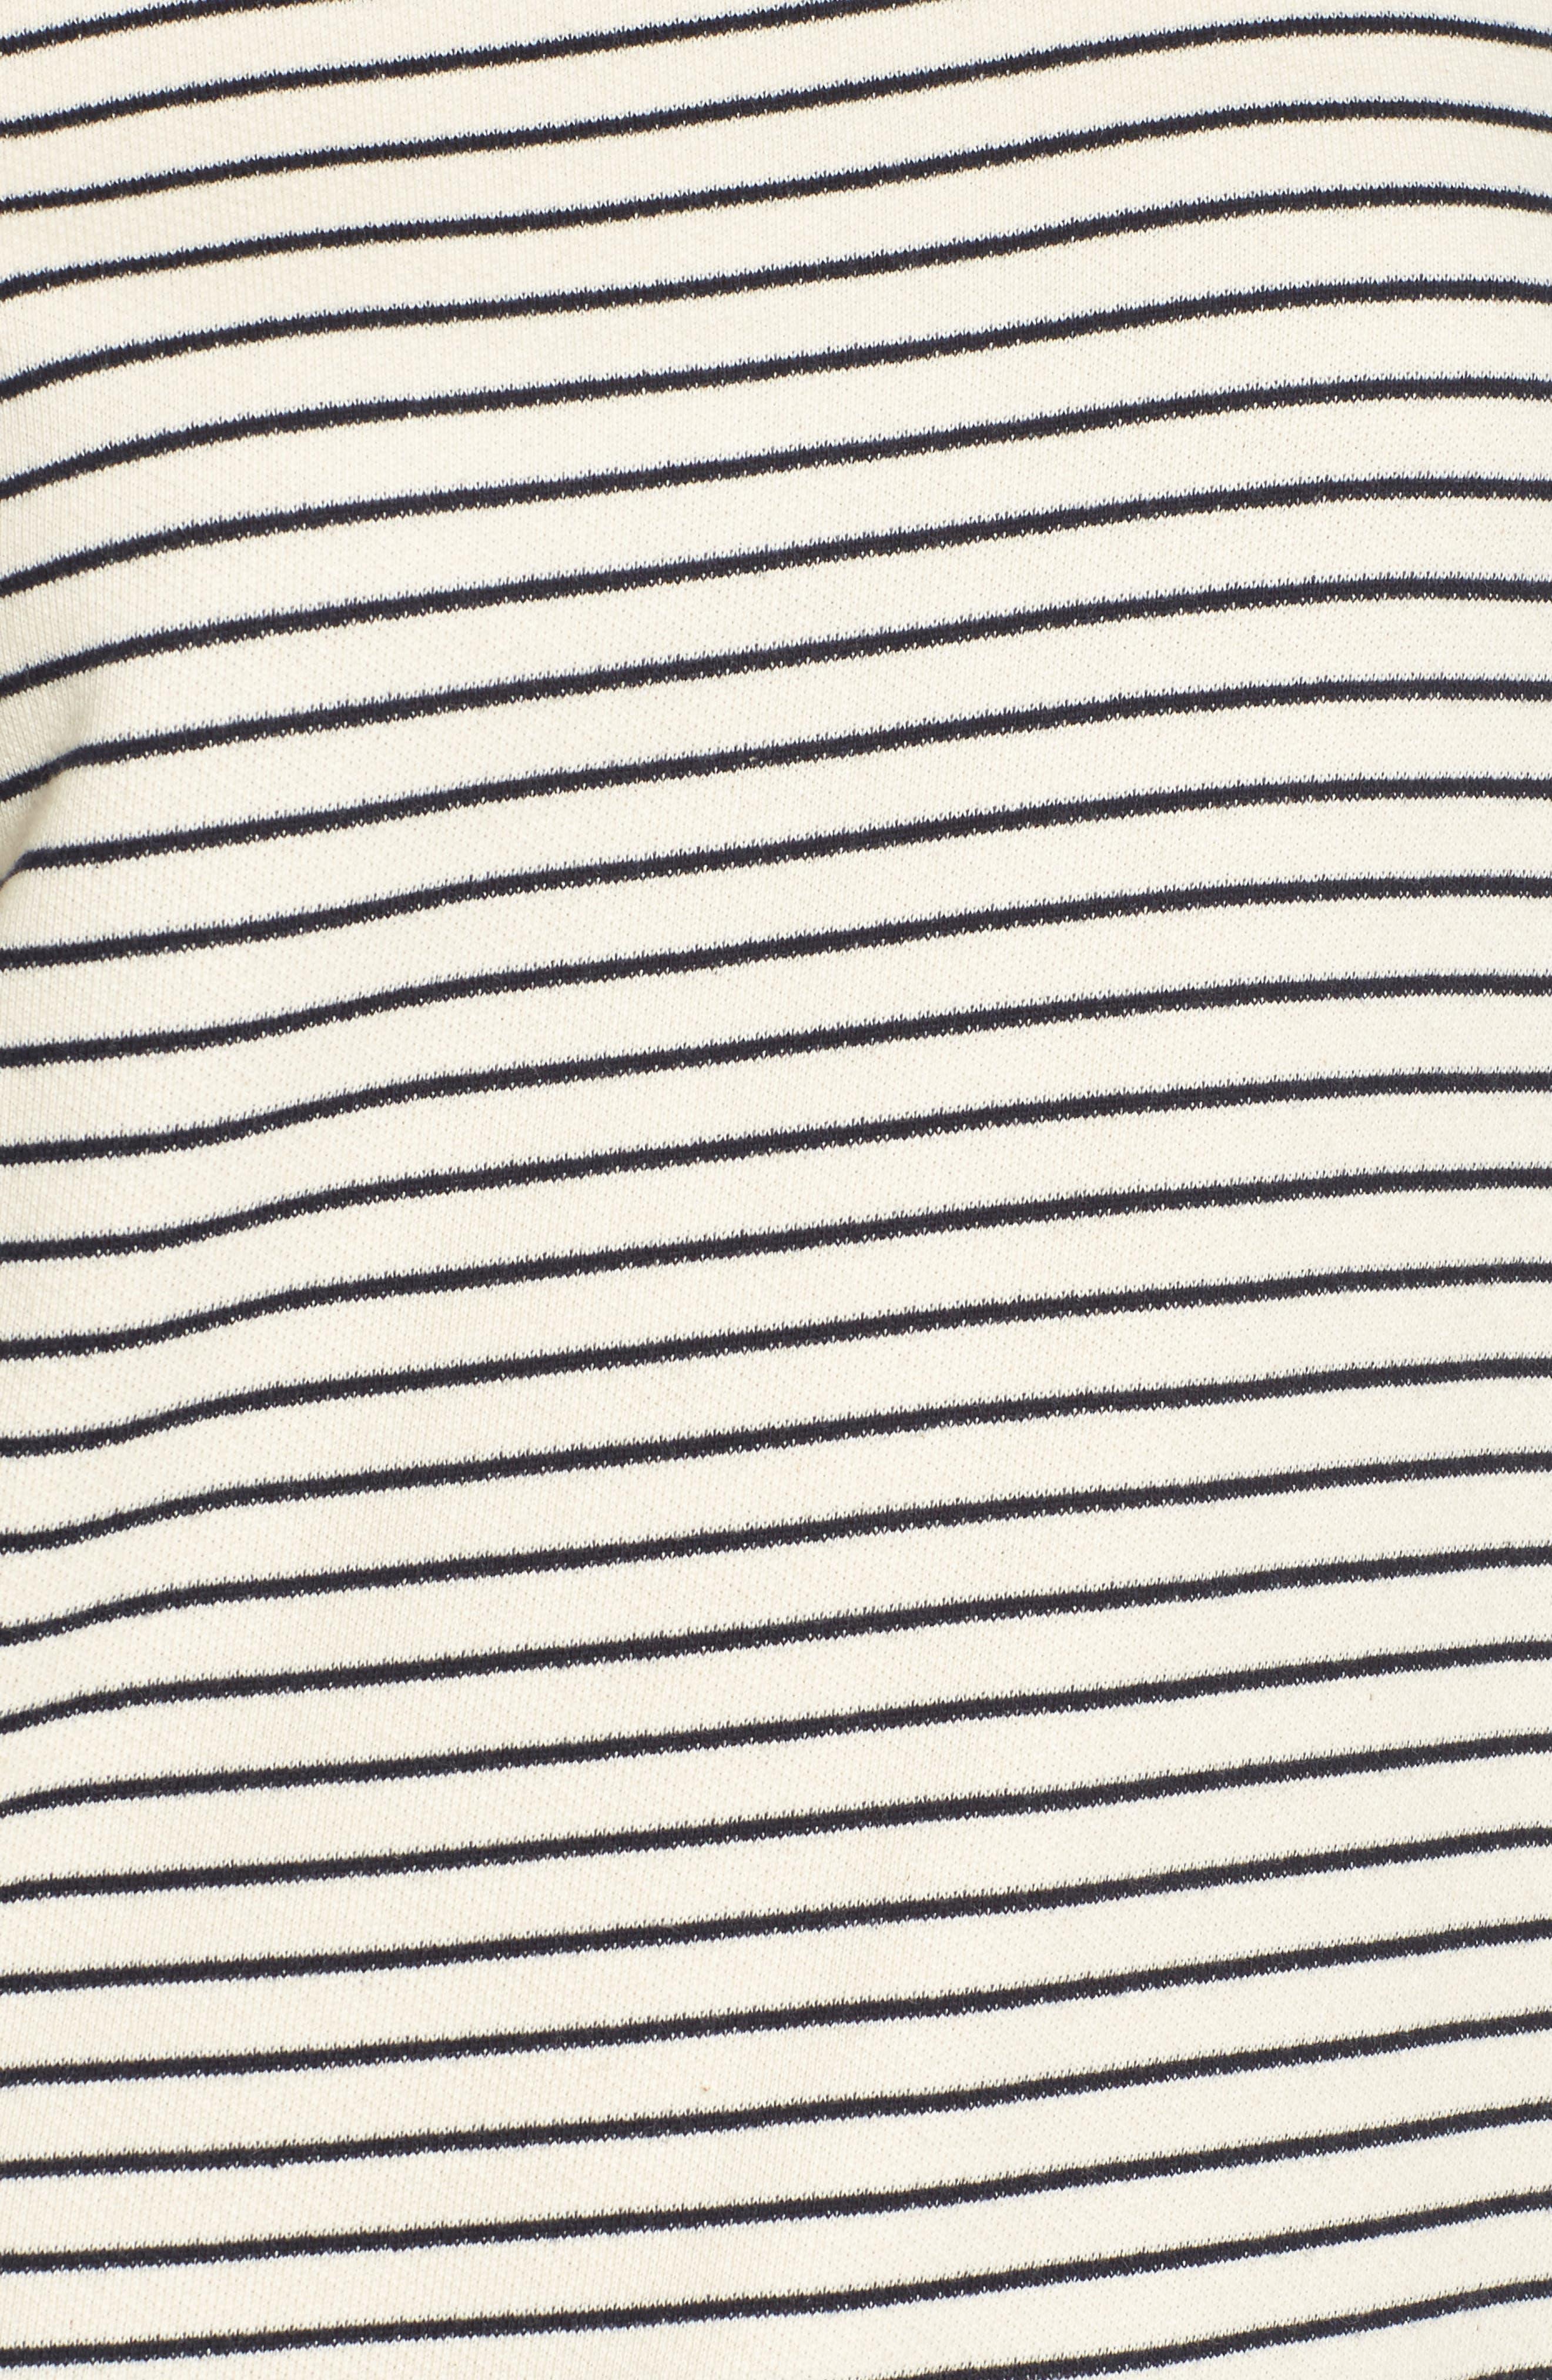 Wildair Cold Shoulder Sweatshirt,                             Alternate thumbnail 5, color,                             460